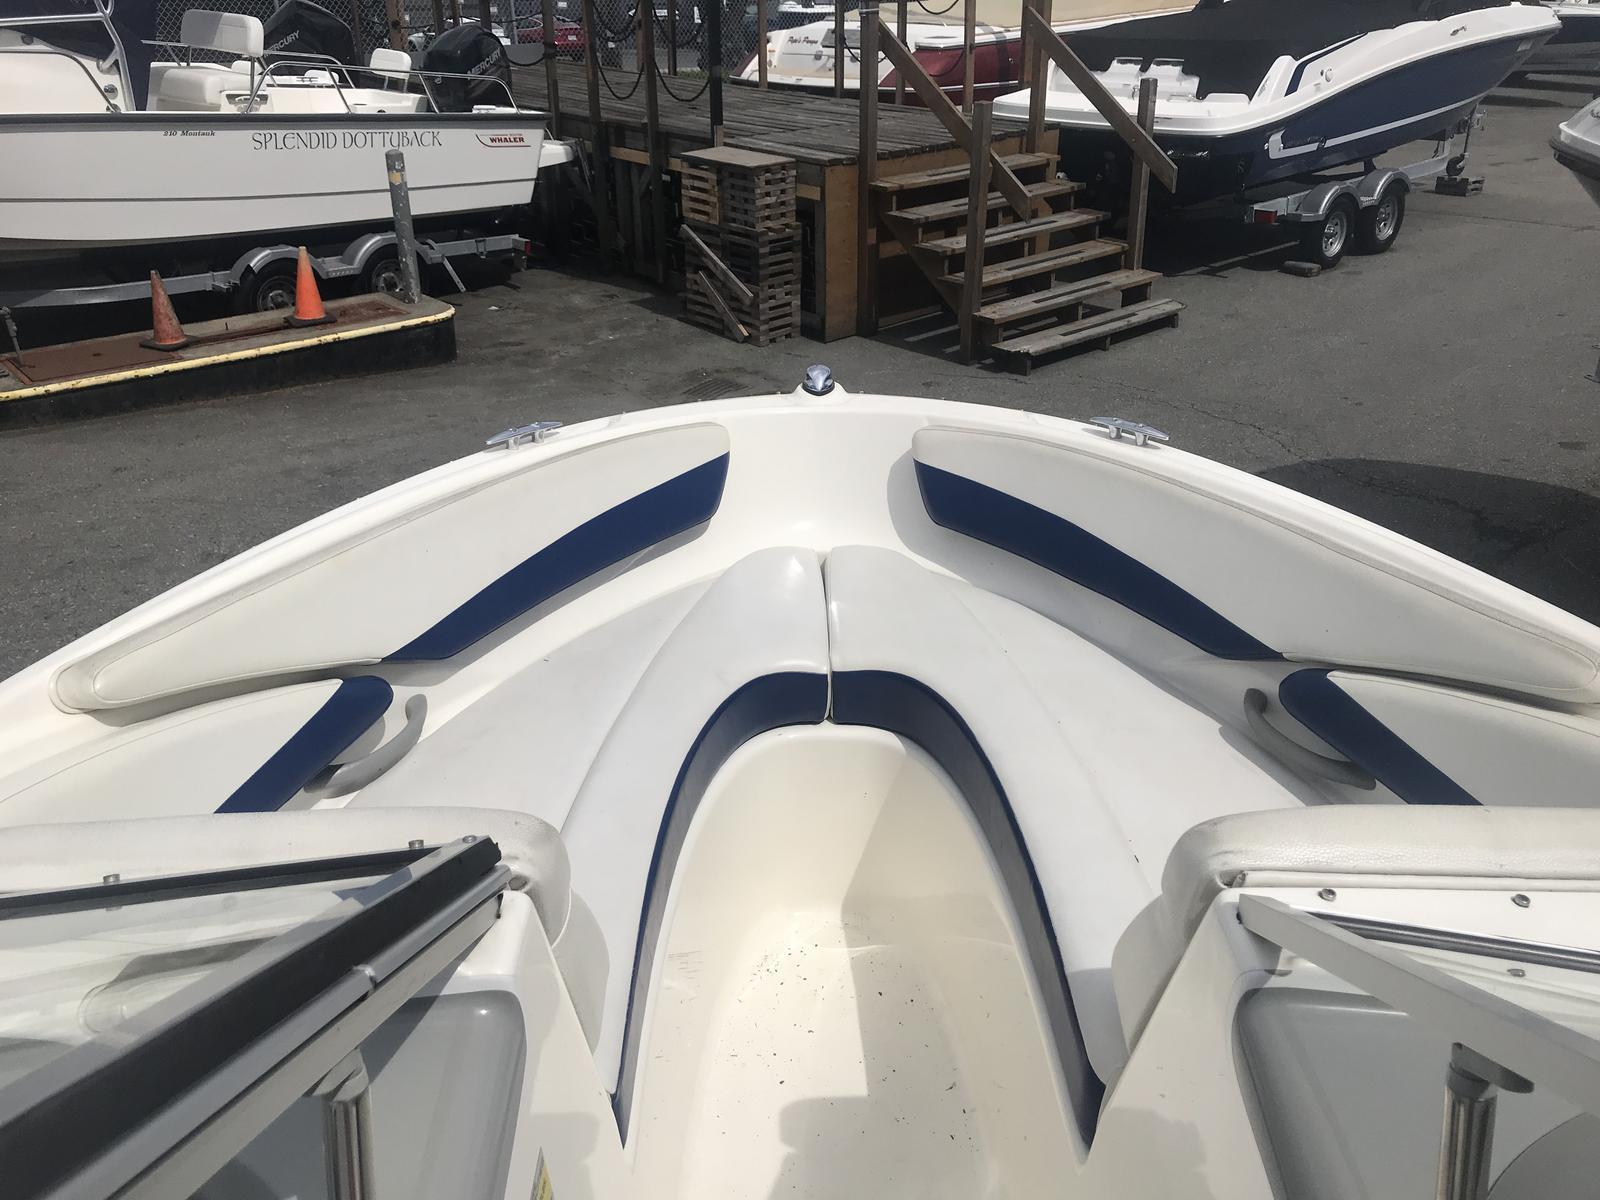 2005 Bayliner boat for sale, model of the boat is 185 & Image # 4 of 5